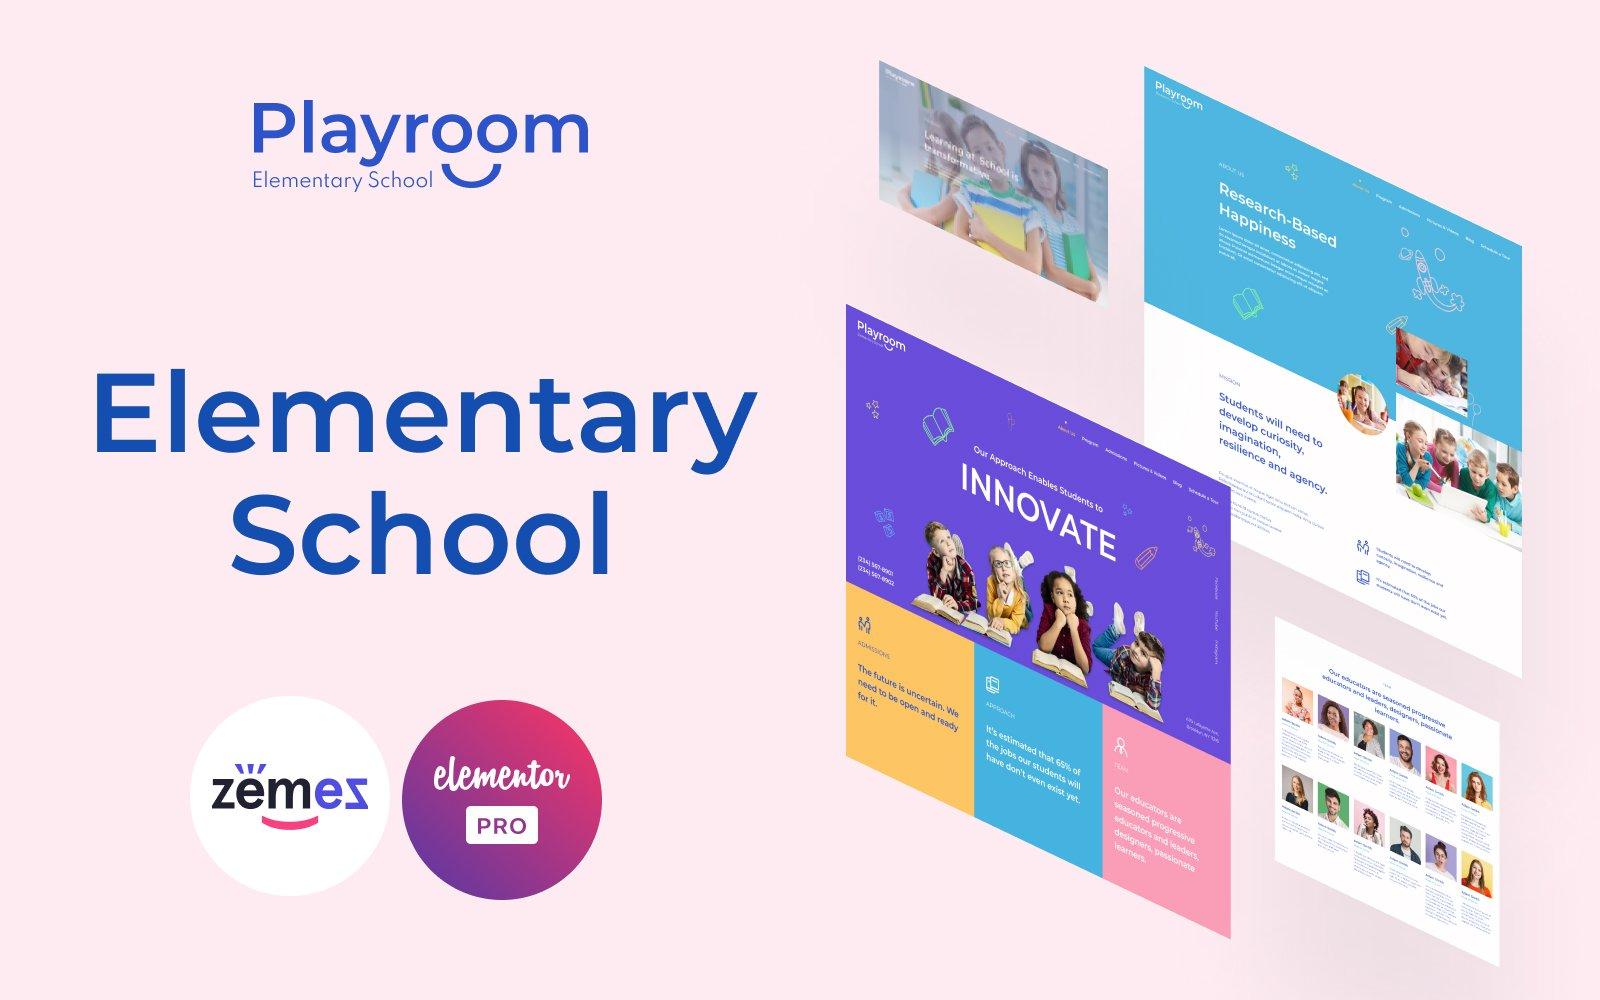 Reszponzív Playroom - Elementary School Elementor sablon 116425